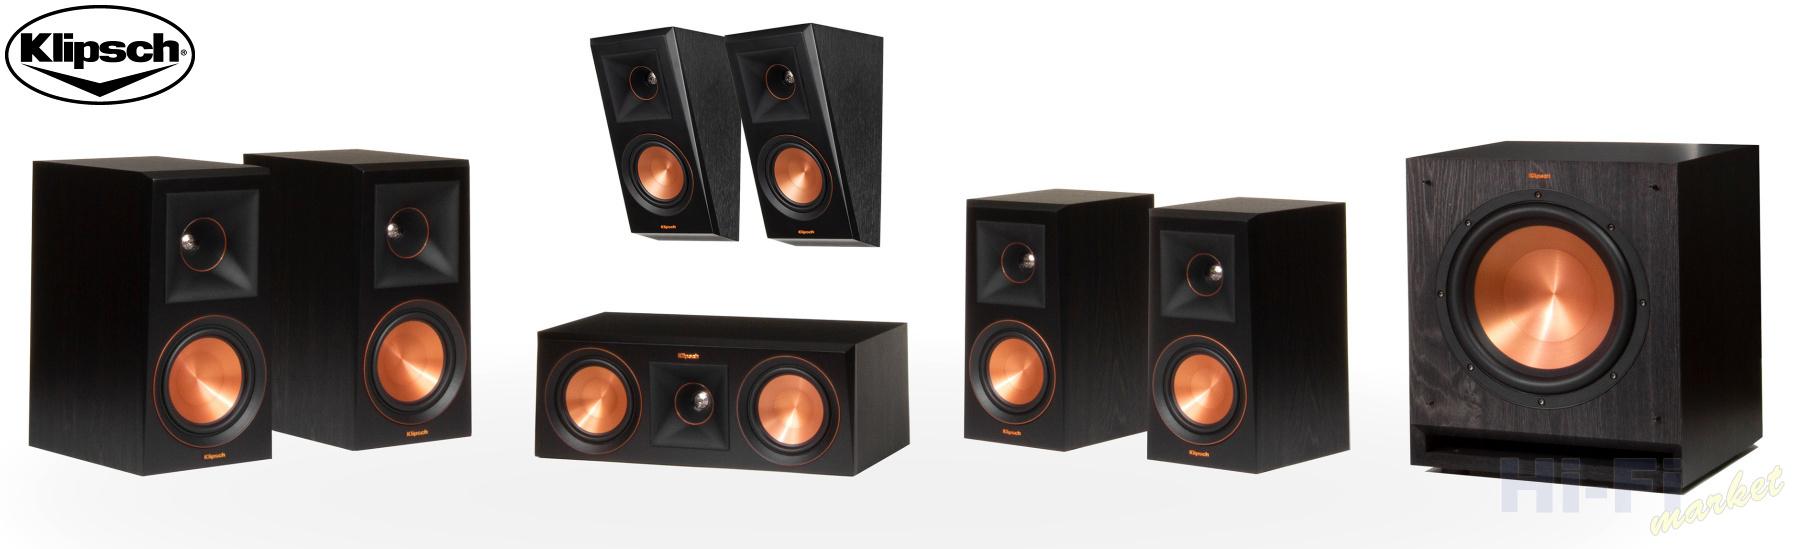 KLIPSCH RP-600M set 5.1.2 Dolby Atmos